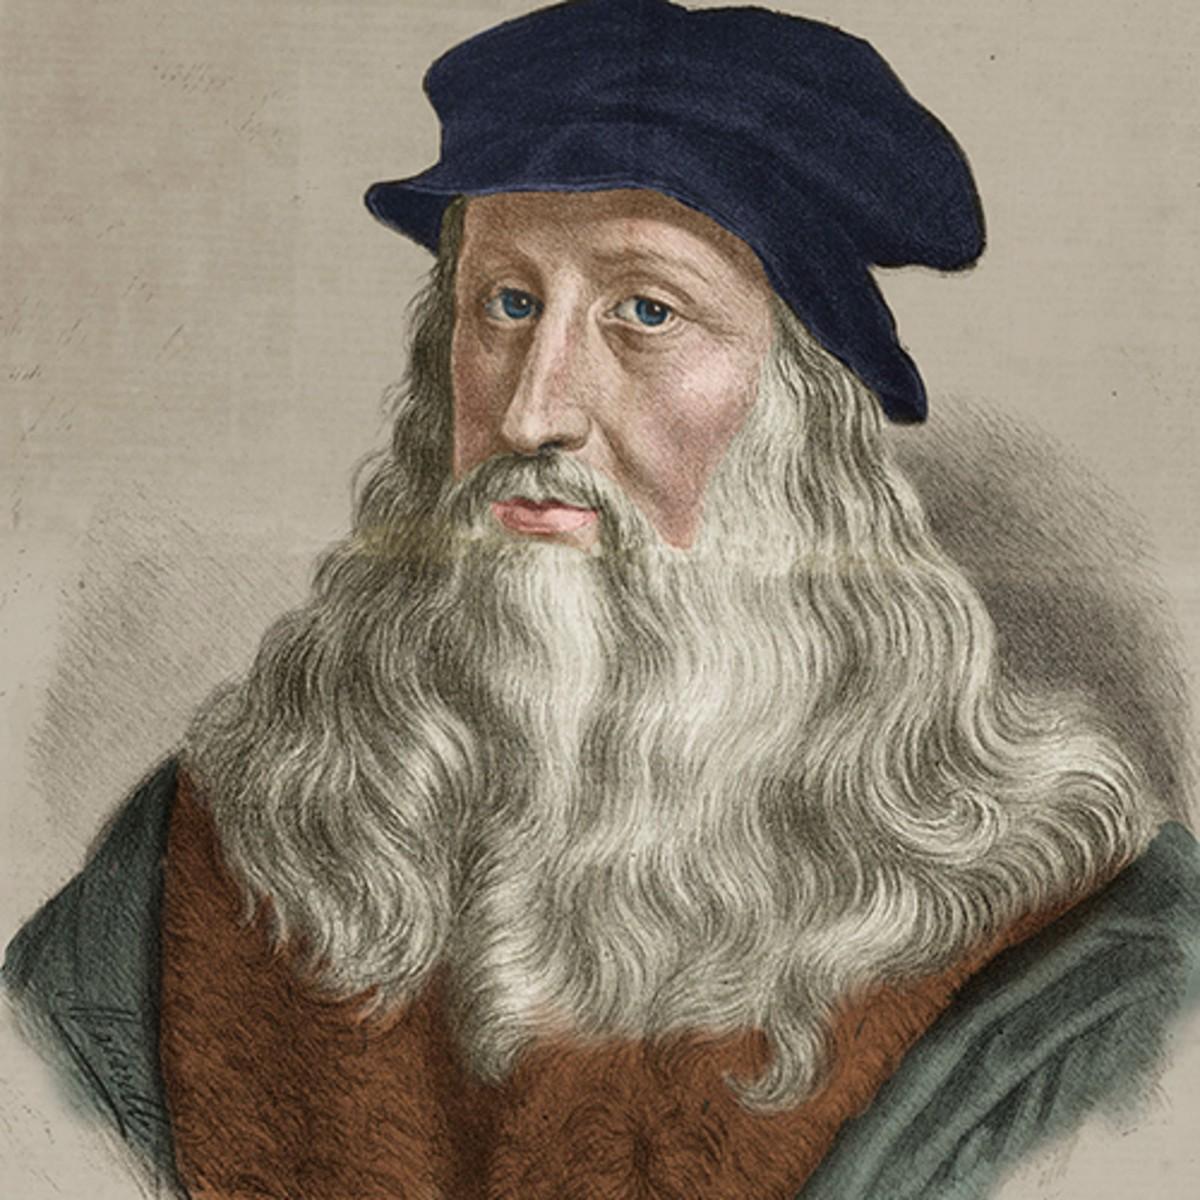 Chân dung Da Vinci qua tranh vẽ.